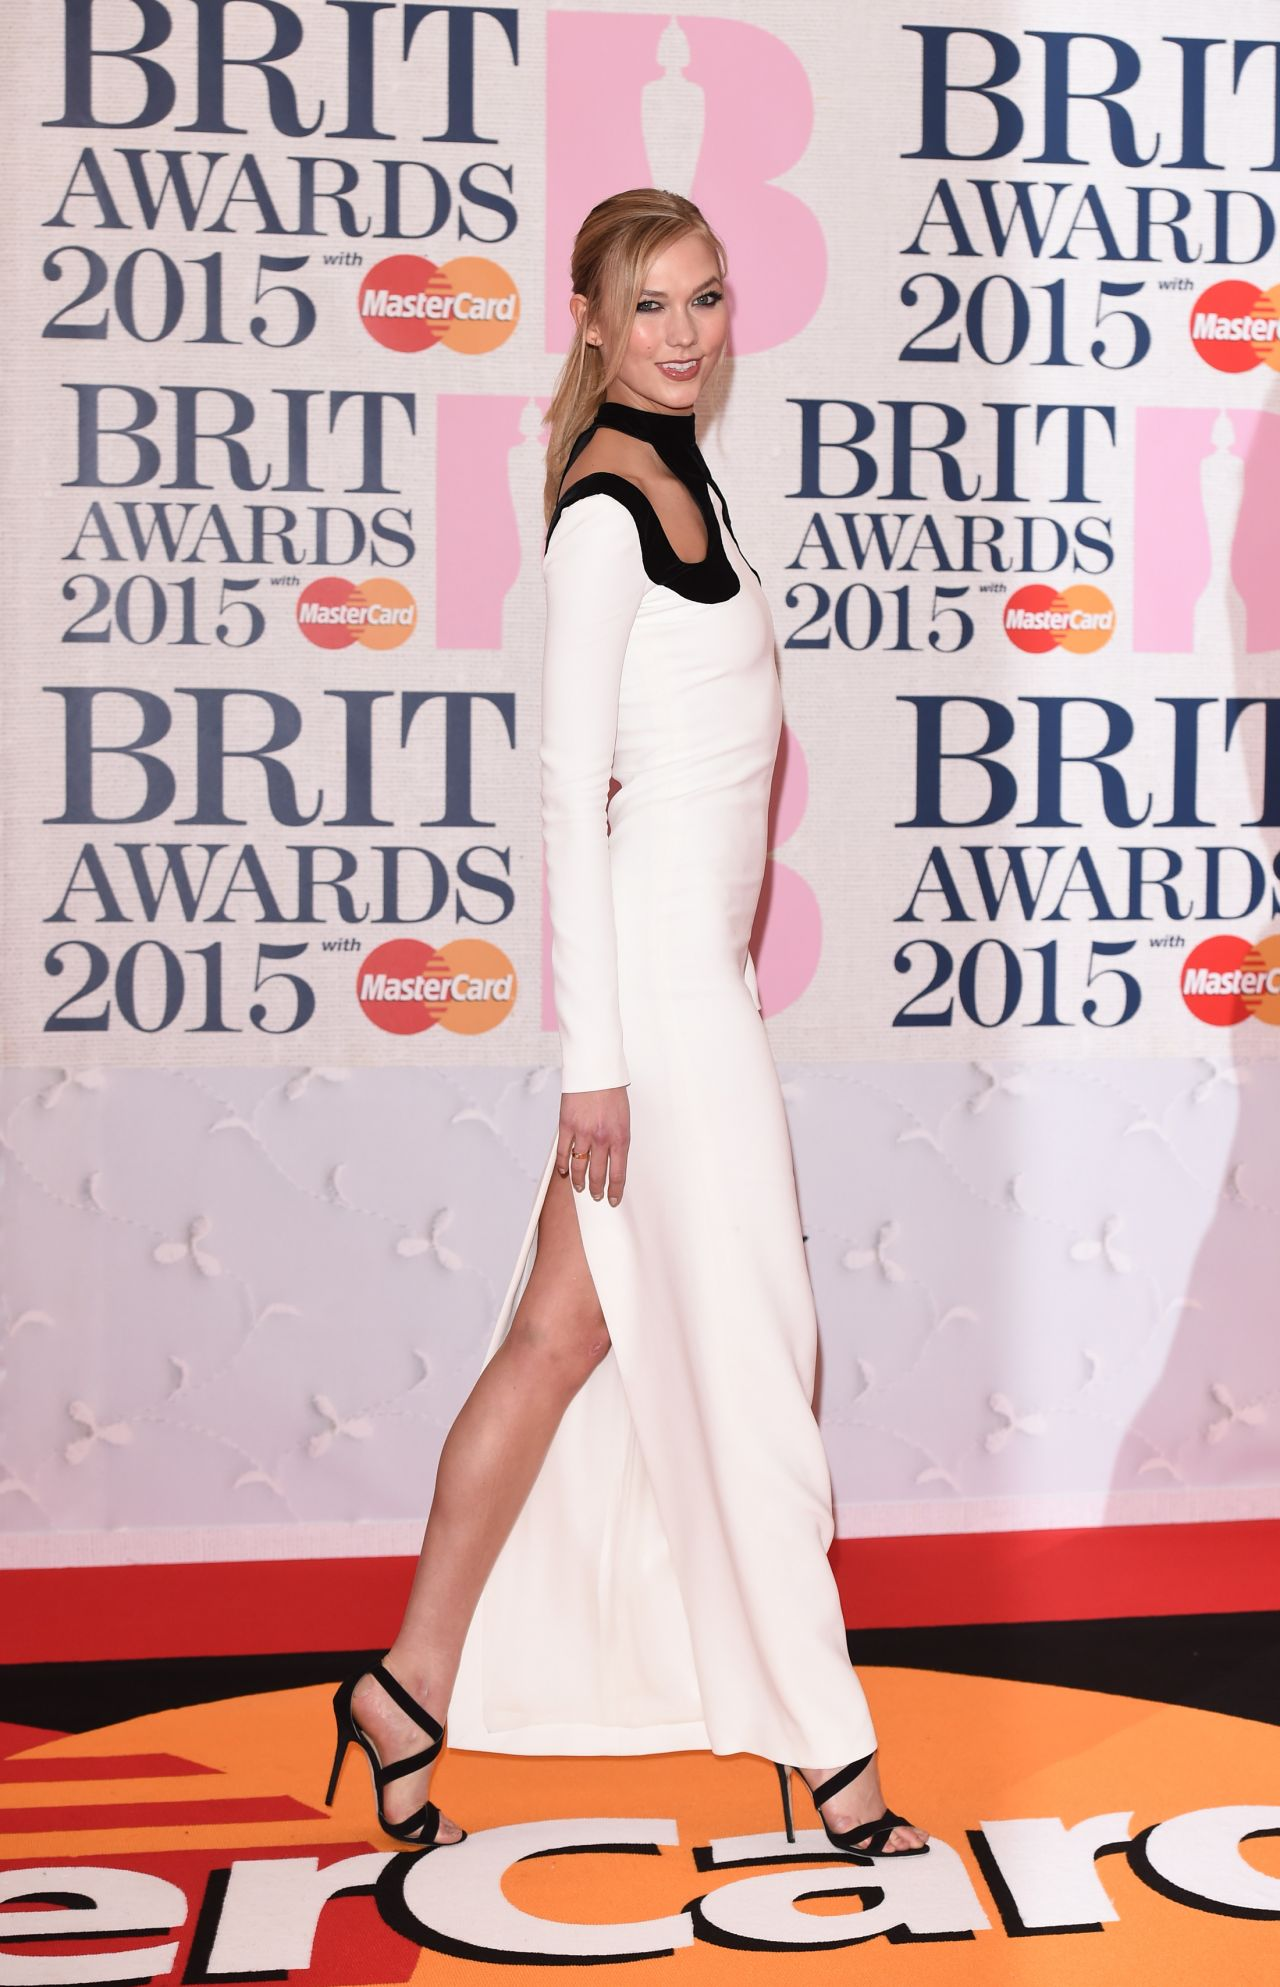 karlie-kloss-tom-ford-2015-brit-awards